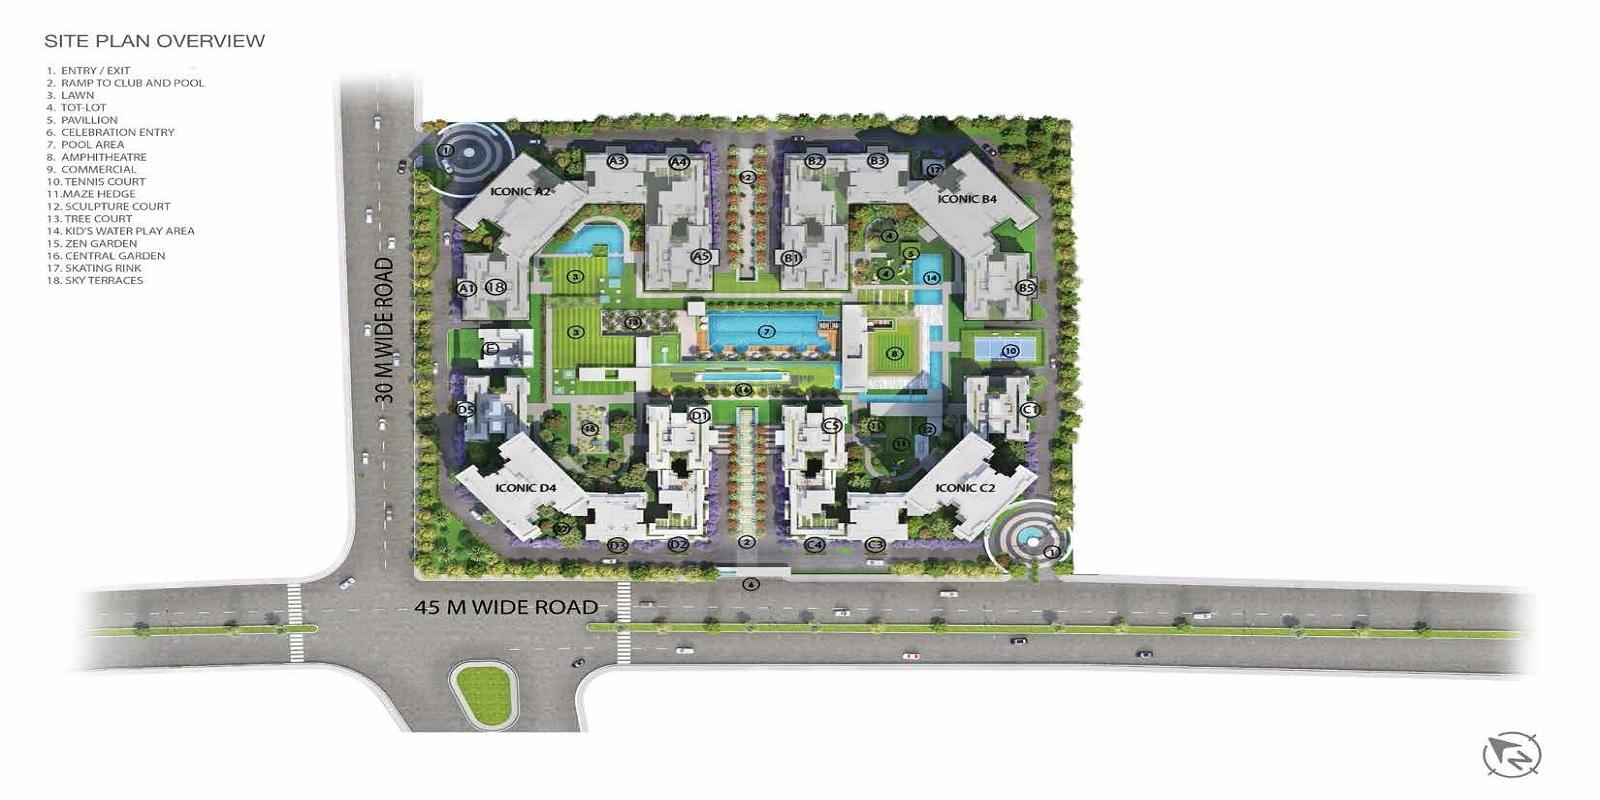 godrej palm retreat master plan image5